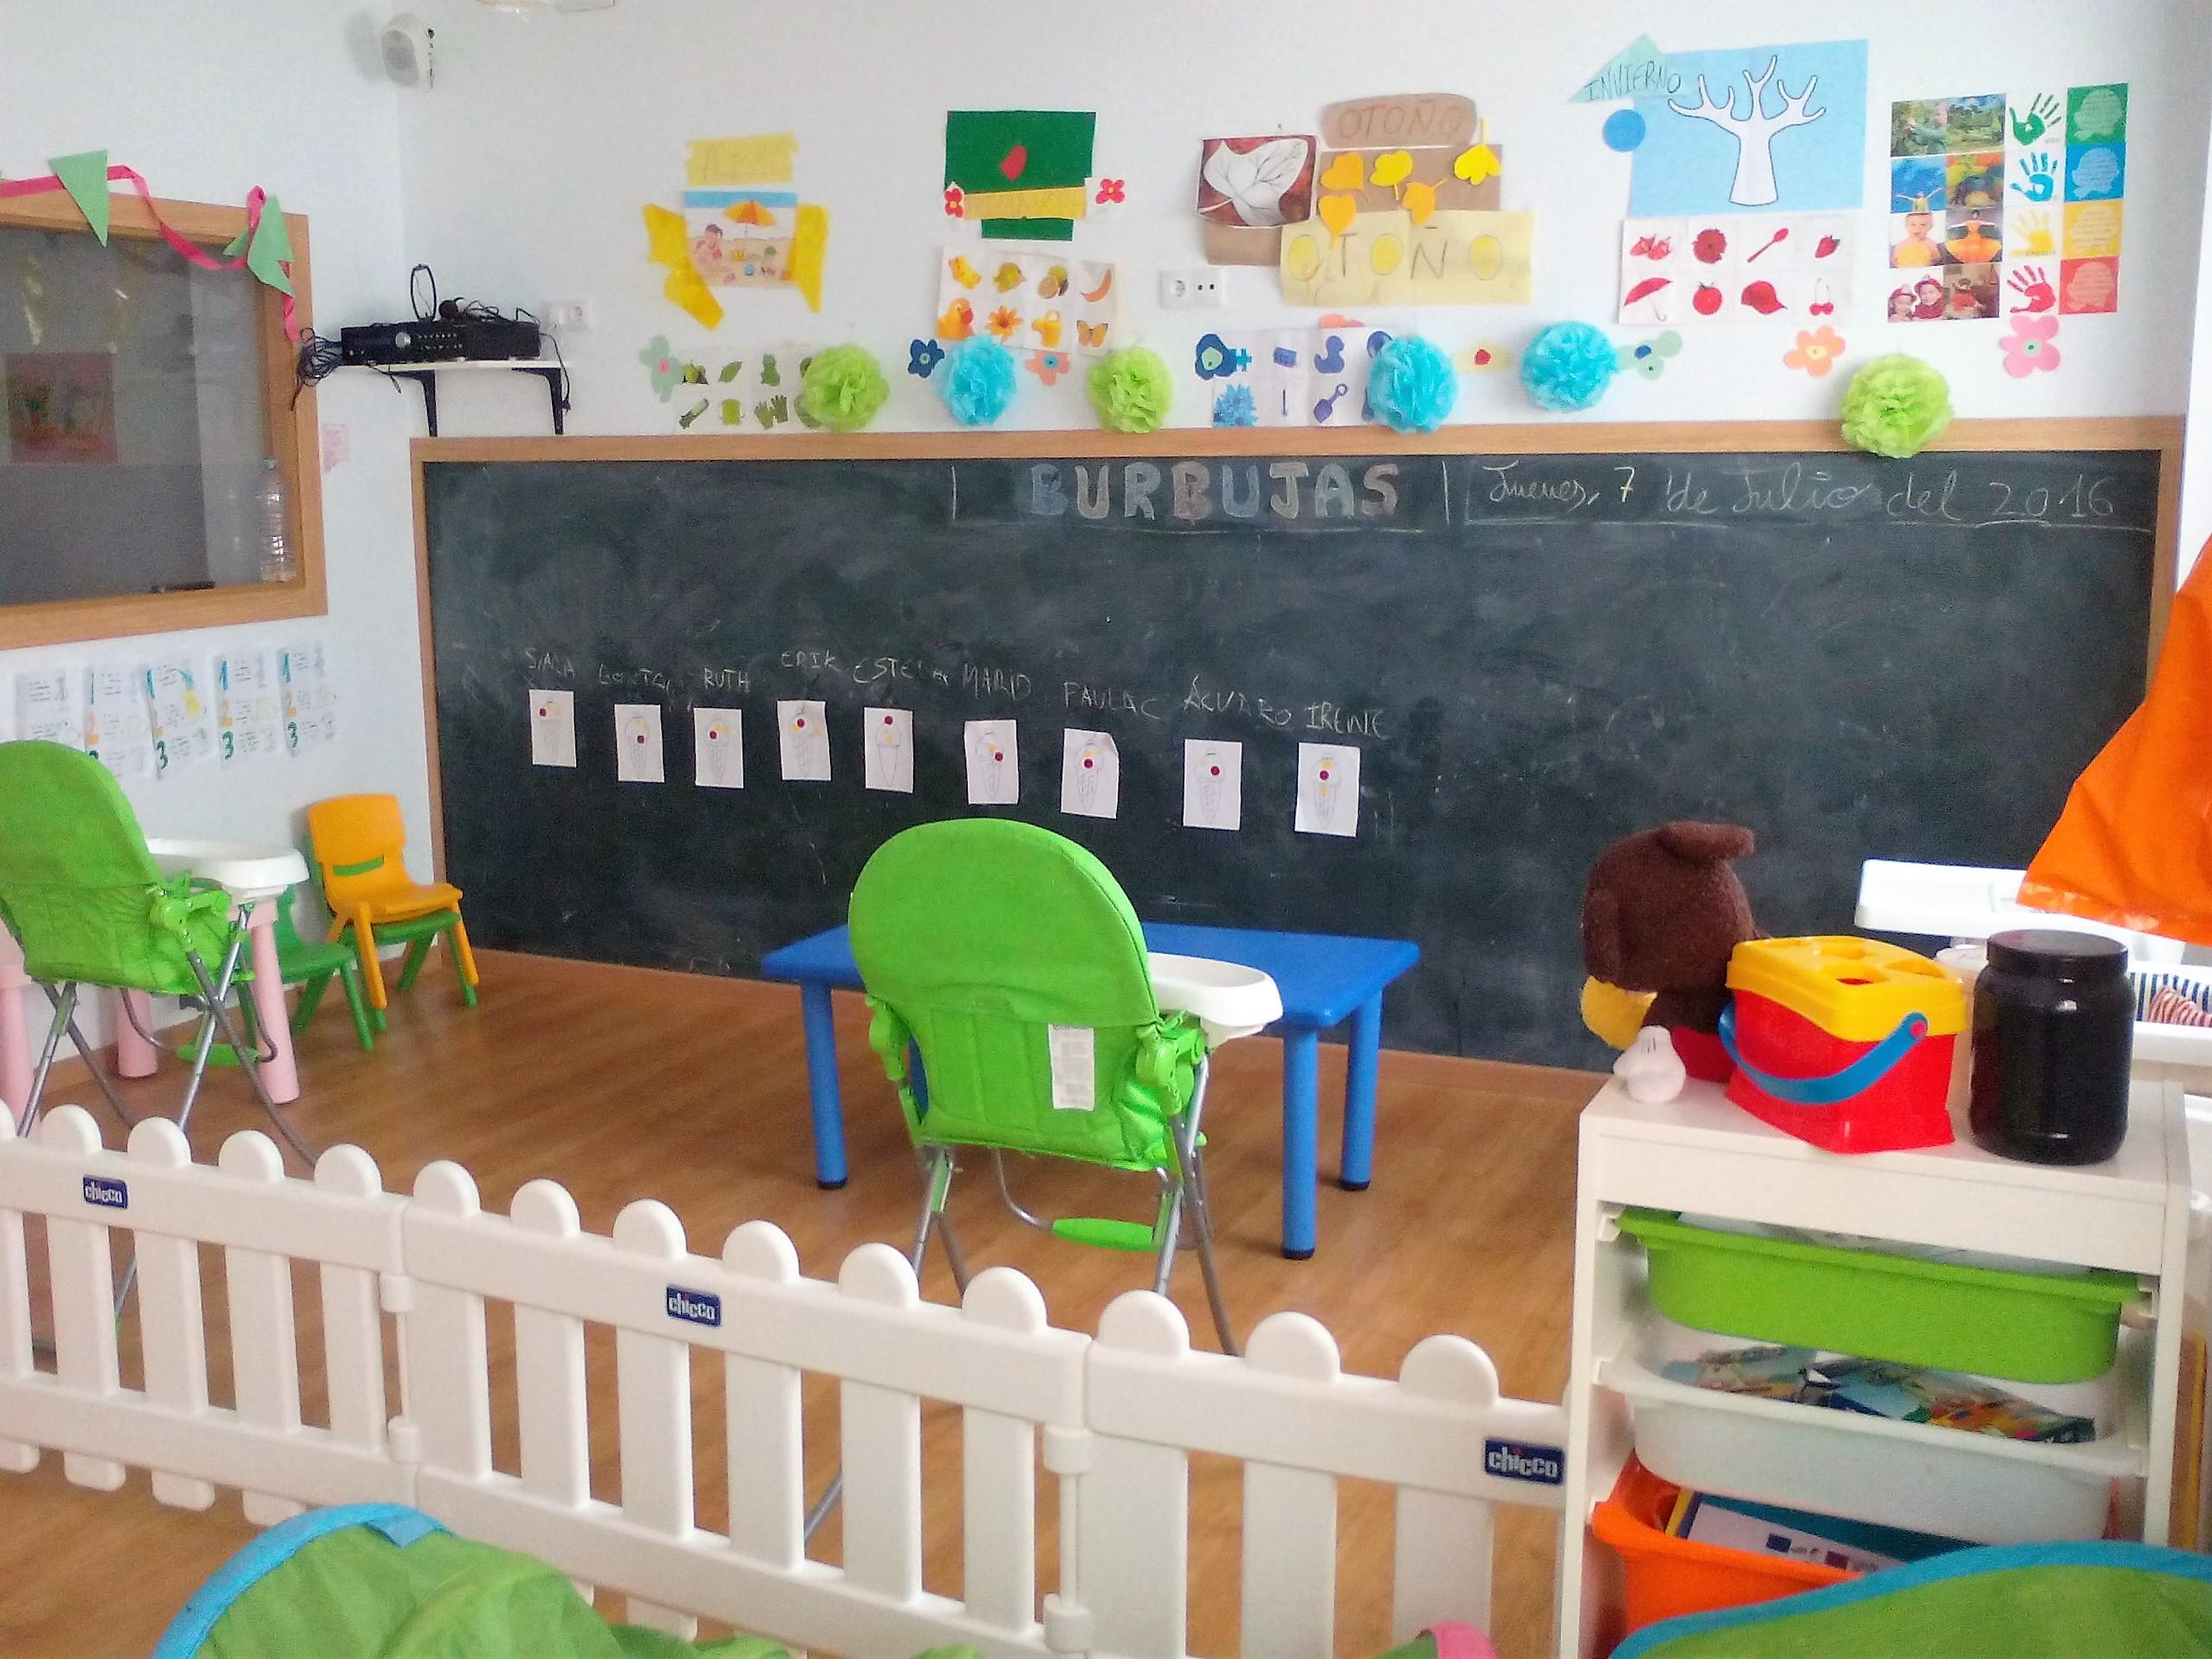 CENTRO INFANTIL EN CACERES BURBUJAS